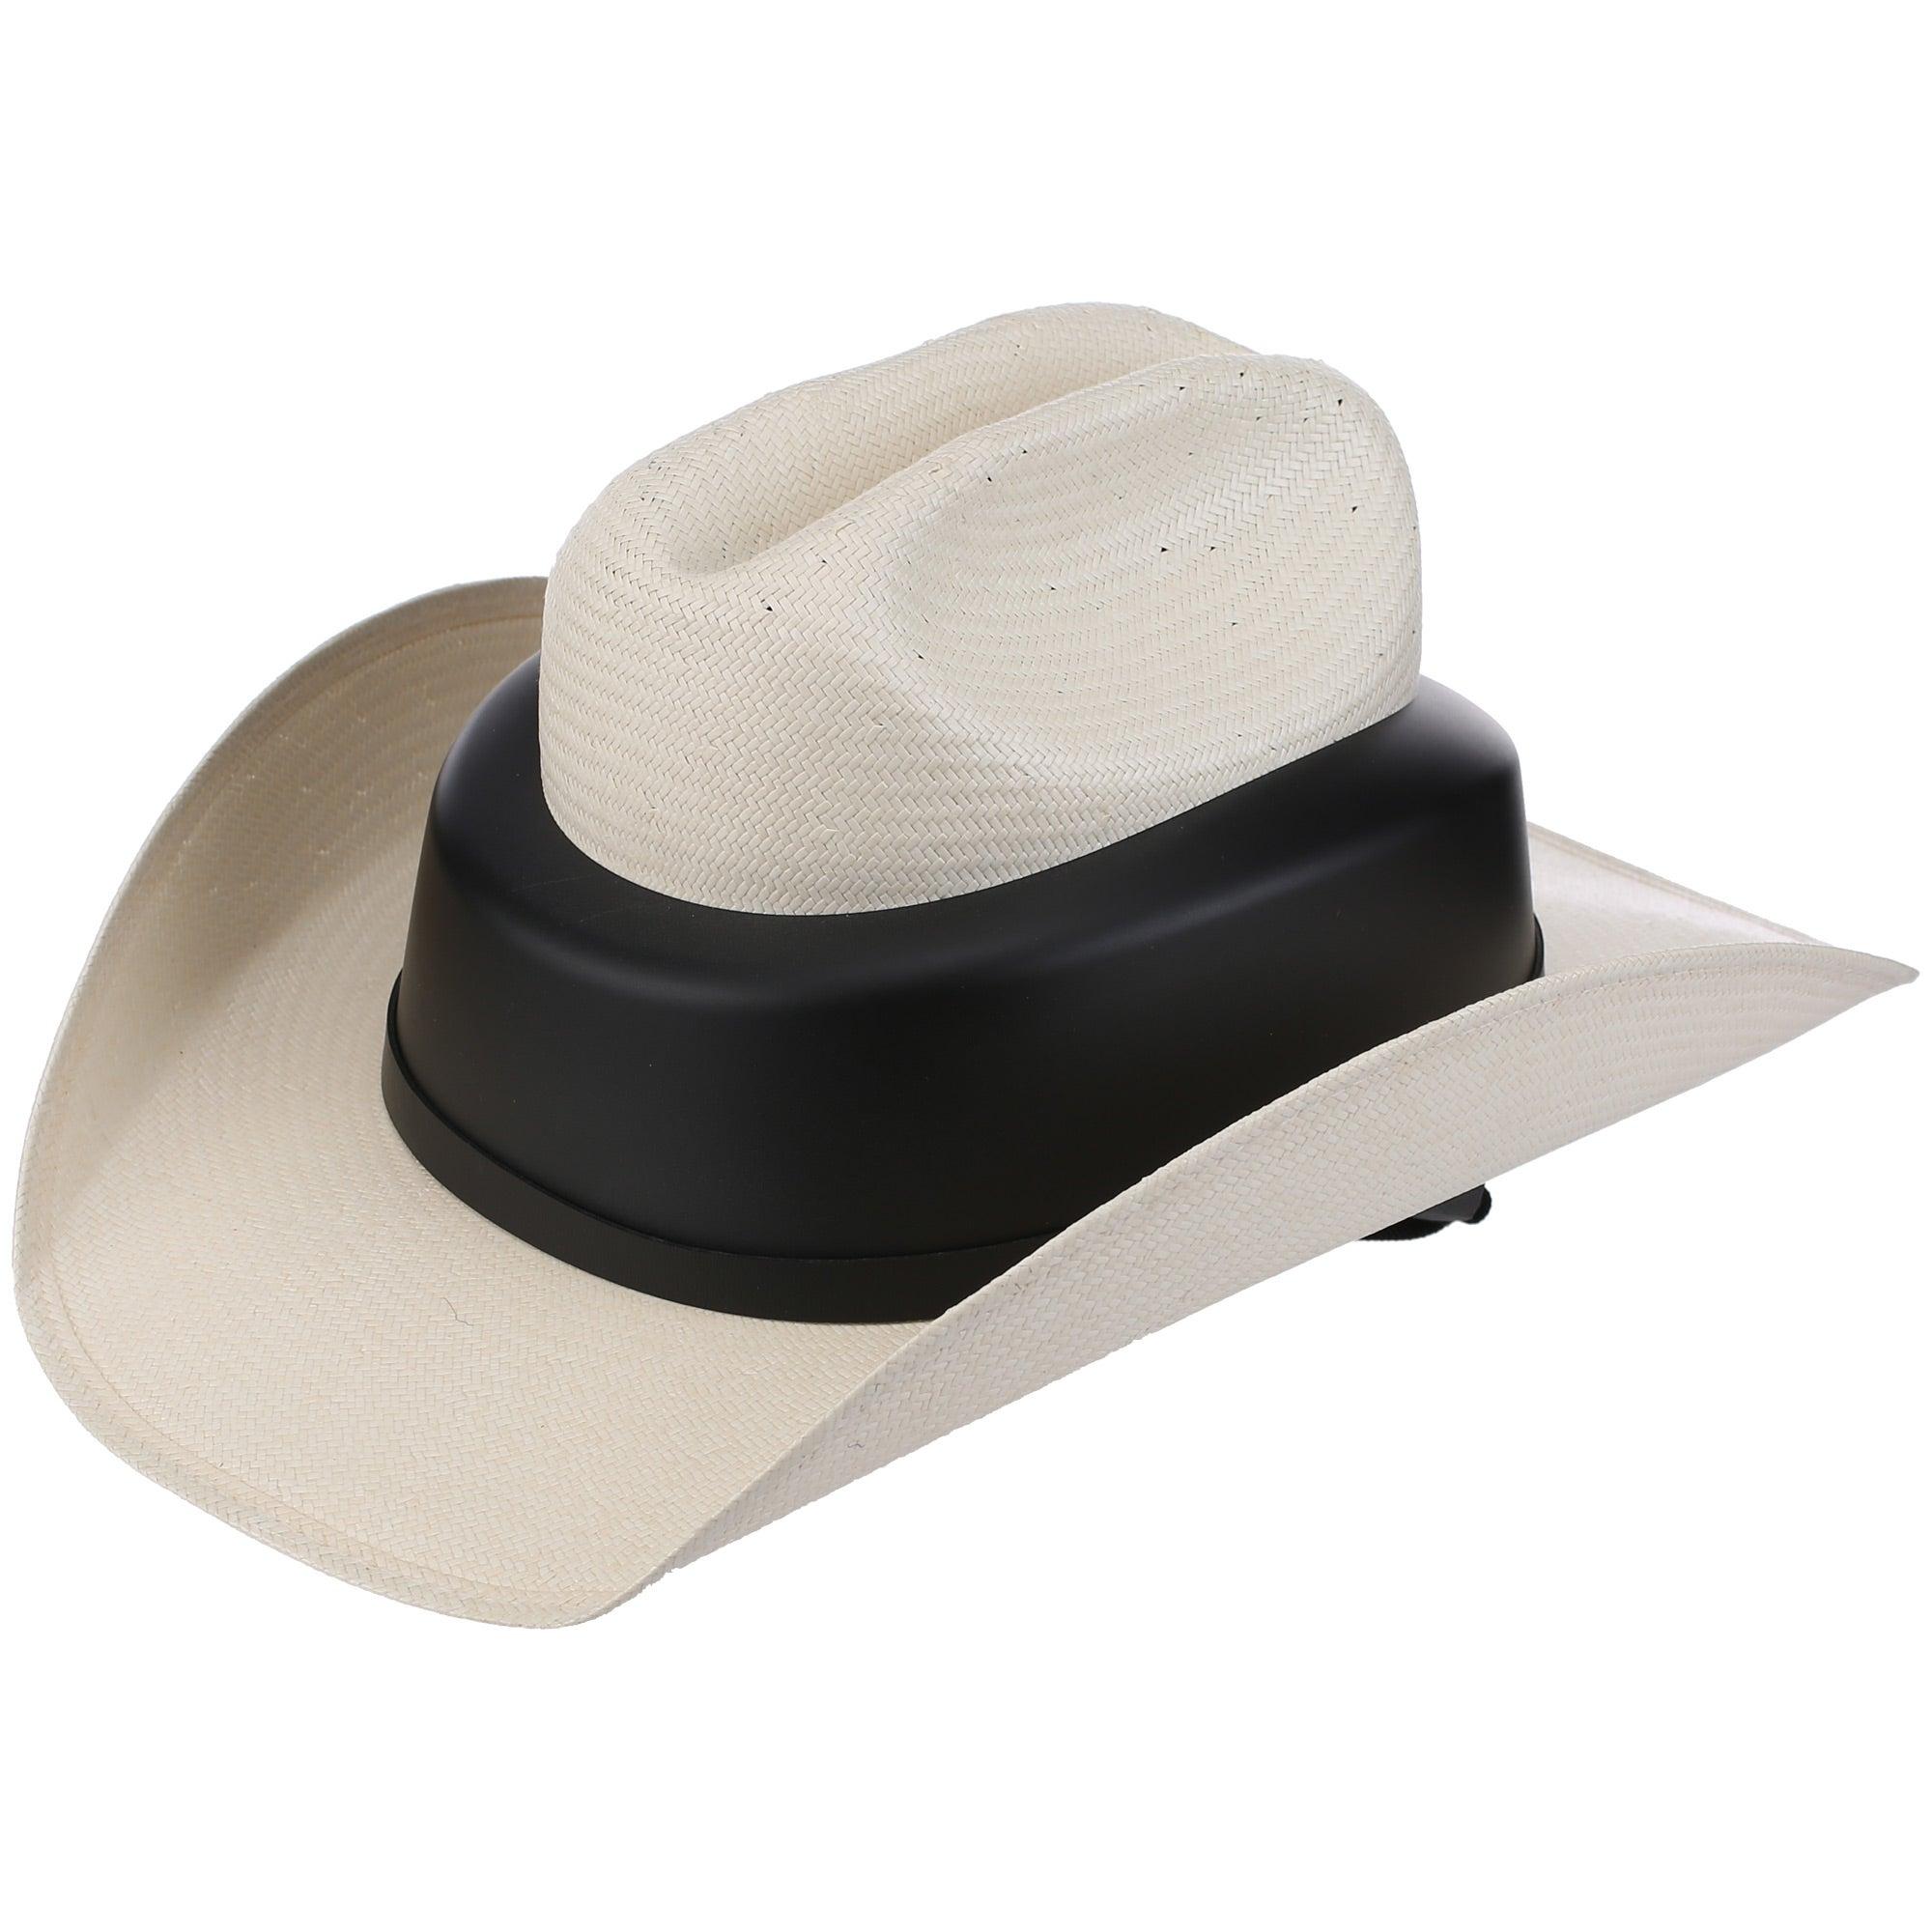 Resistol RideSafe Western Straw Cowboy Hat Helmet - Riding Warehouse 235f6888c4a